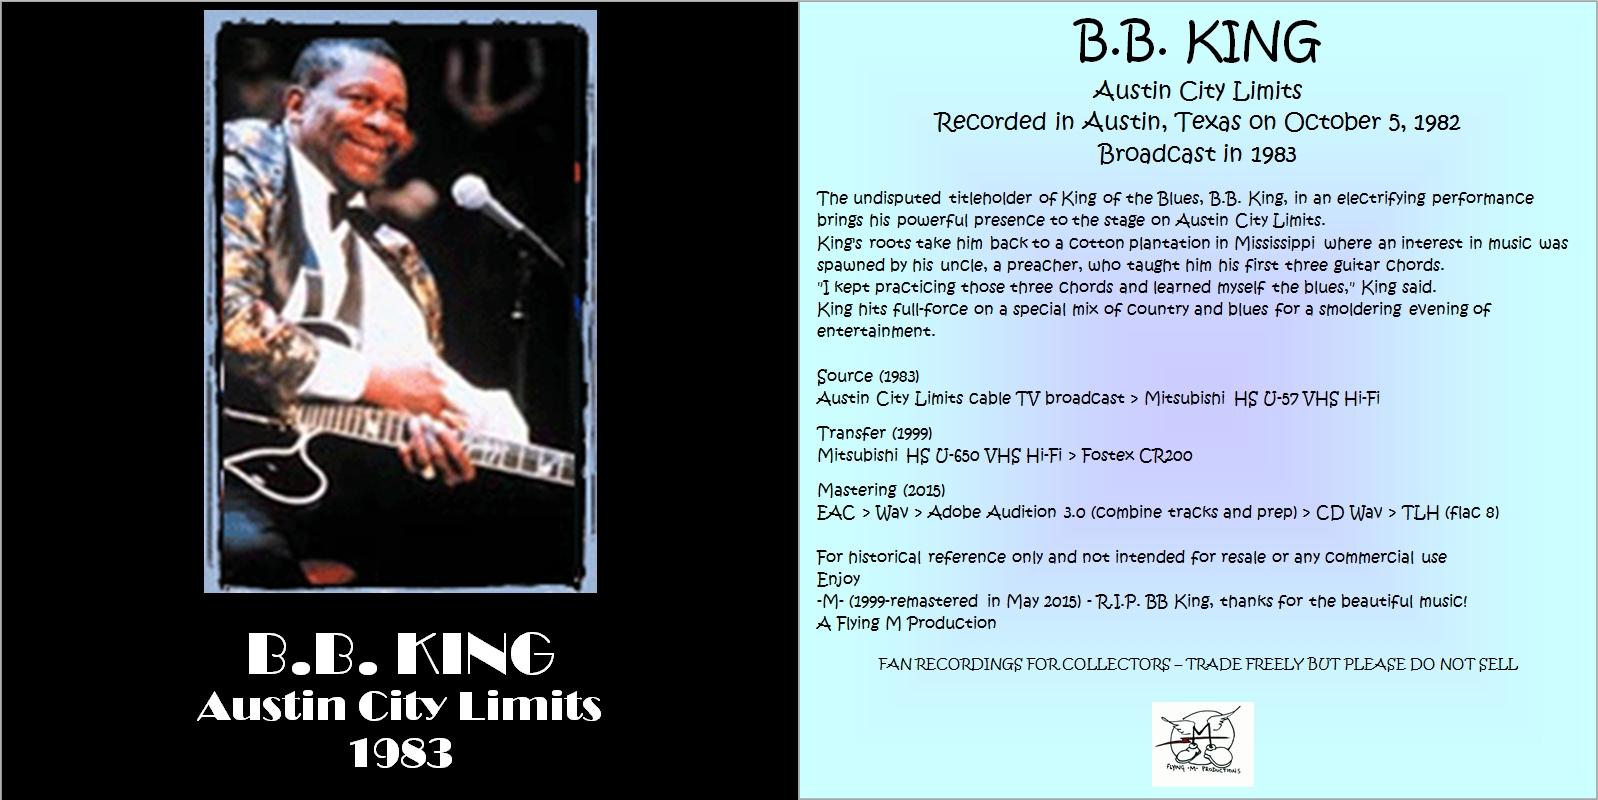 BBKing1982-10-05AustinCityLimitsTX1.JPG